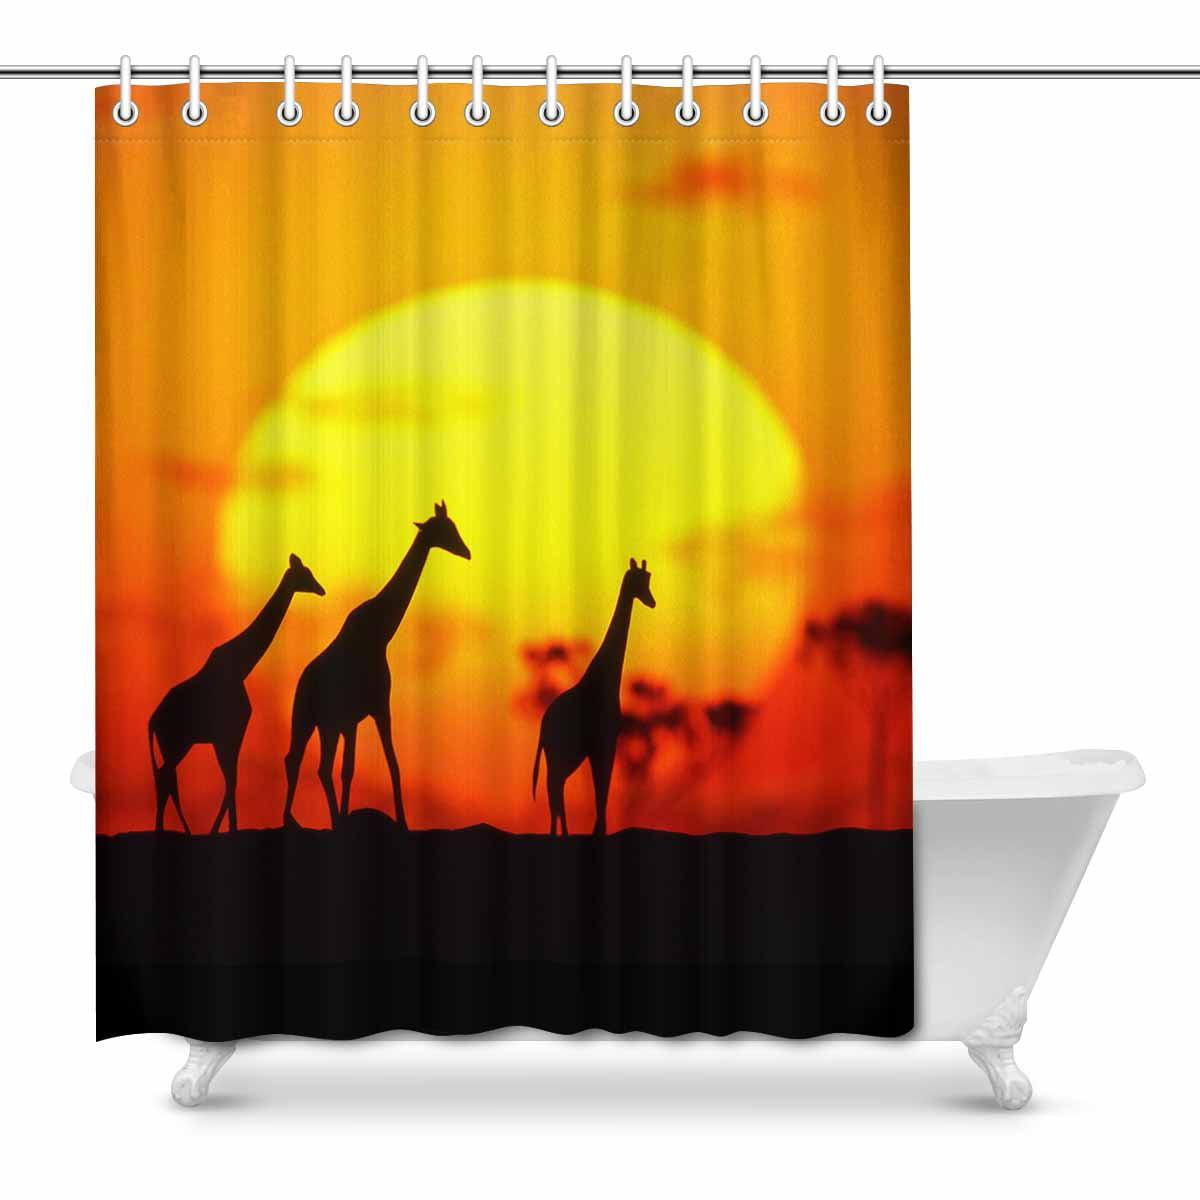 Mkhert Giraffe Family Silhouette Over Sunrise In Kenya African Savanna House Decor Shower Curtain For Bathroom Decorative Fabric Bath Curtain Set